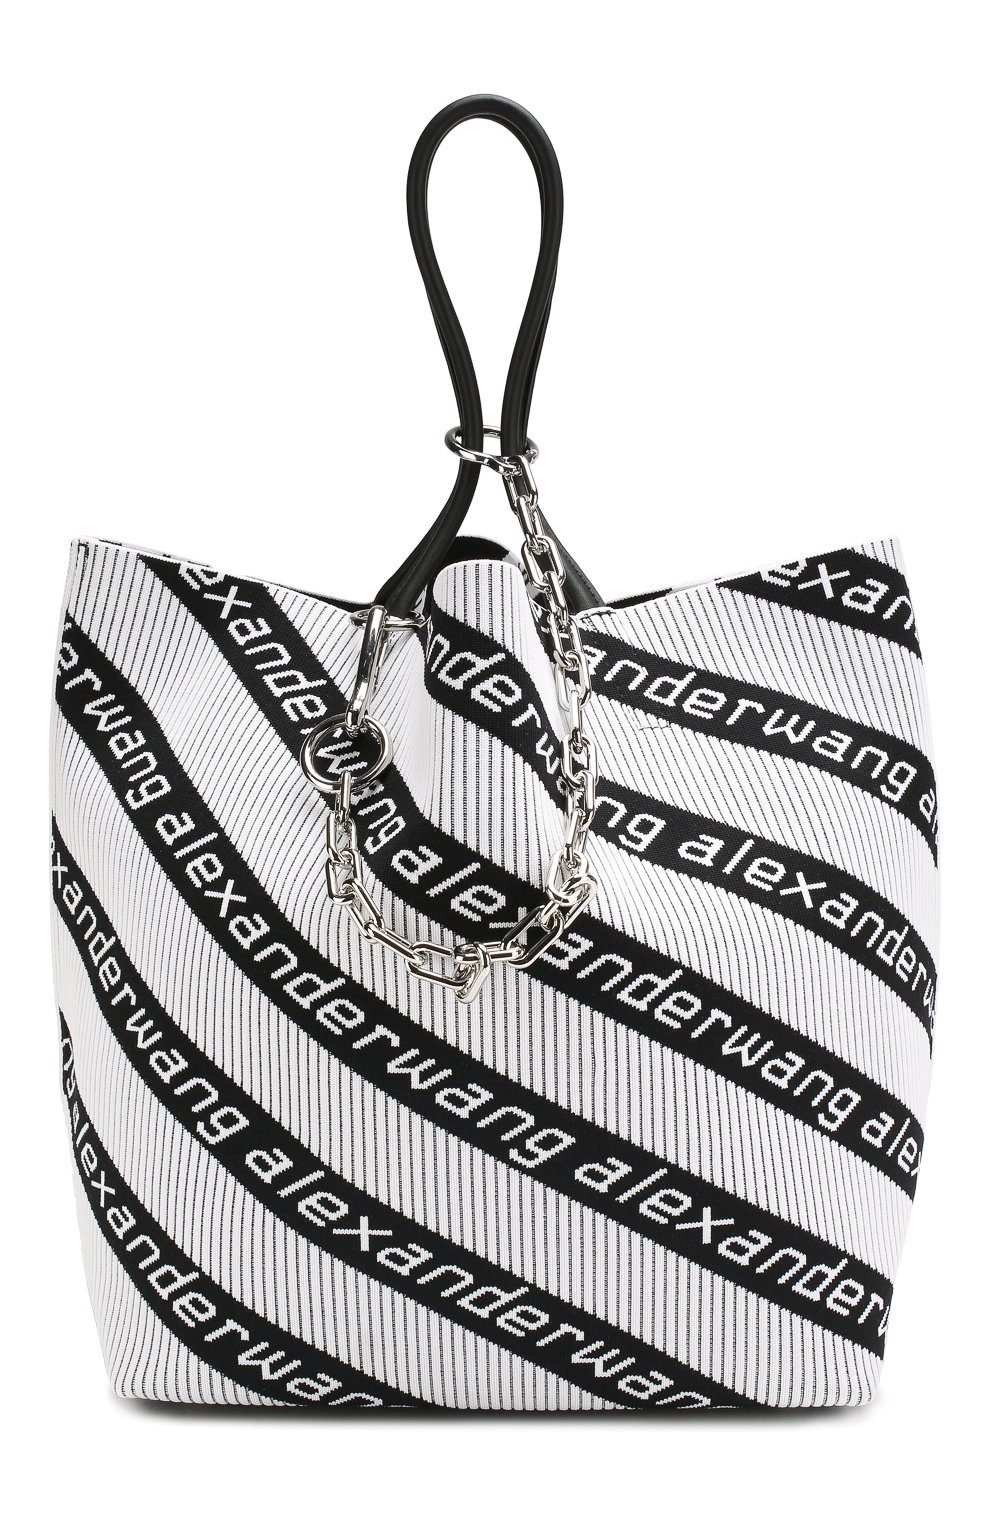 Сумка Roxy  Alexander Wang черно-белая цвета | Фото №1